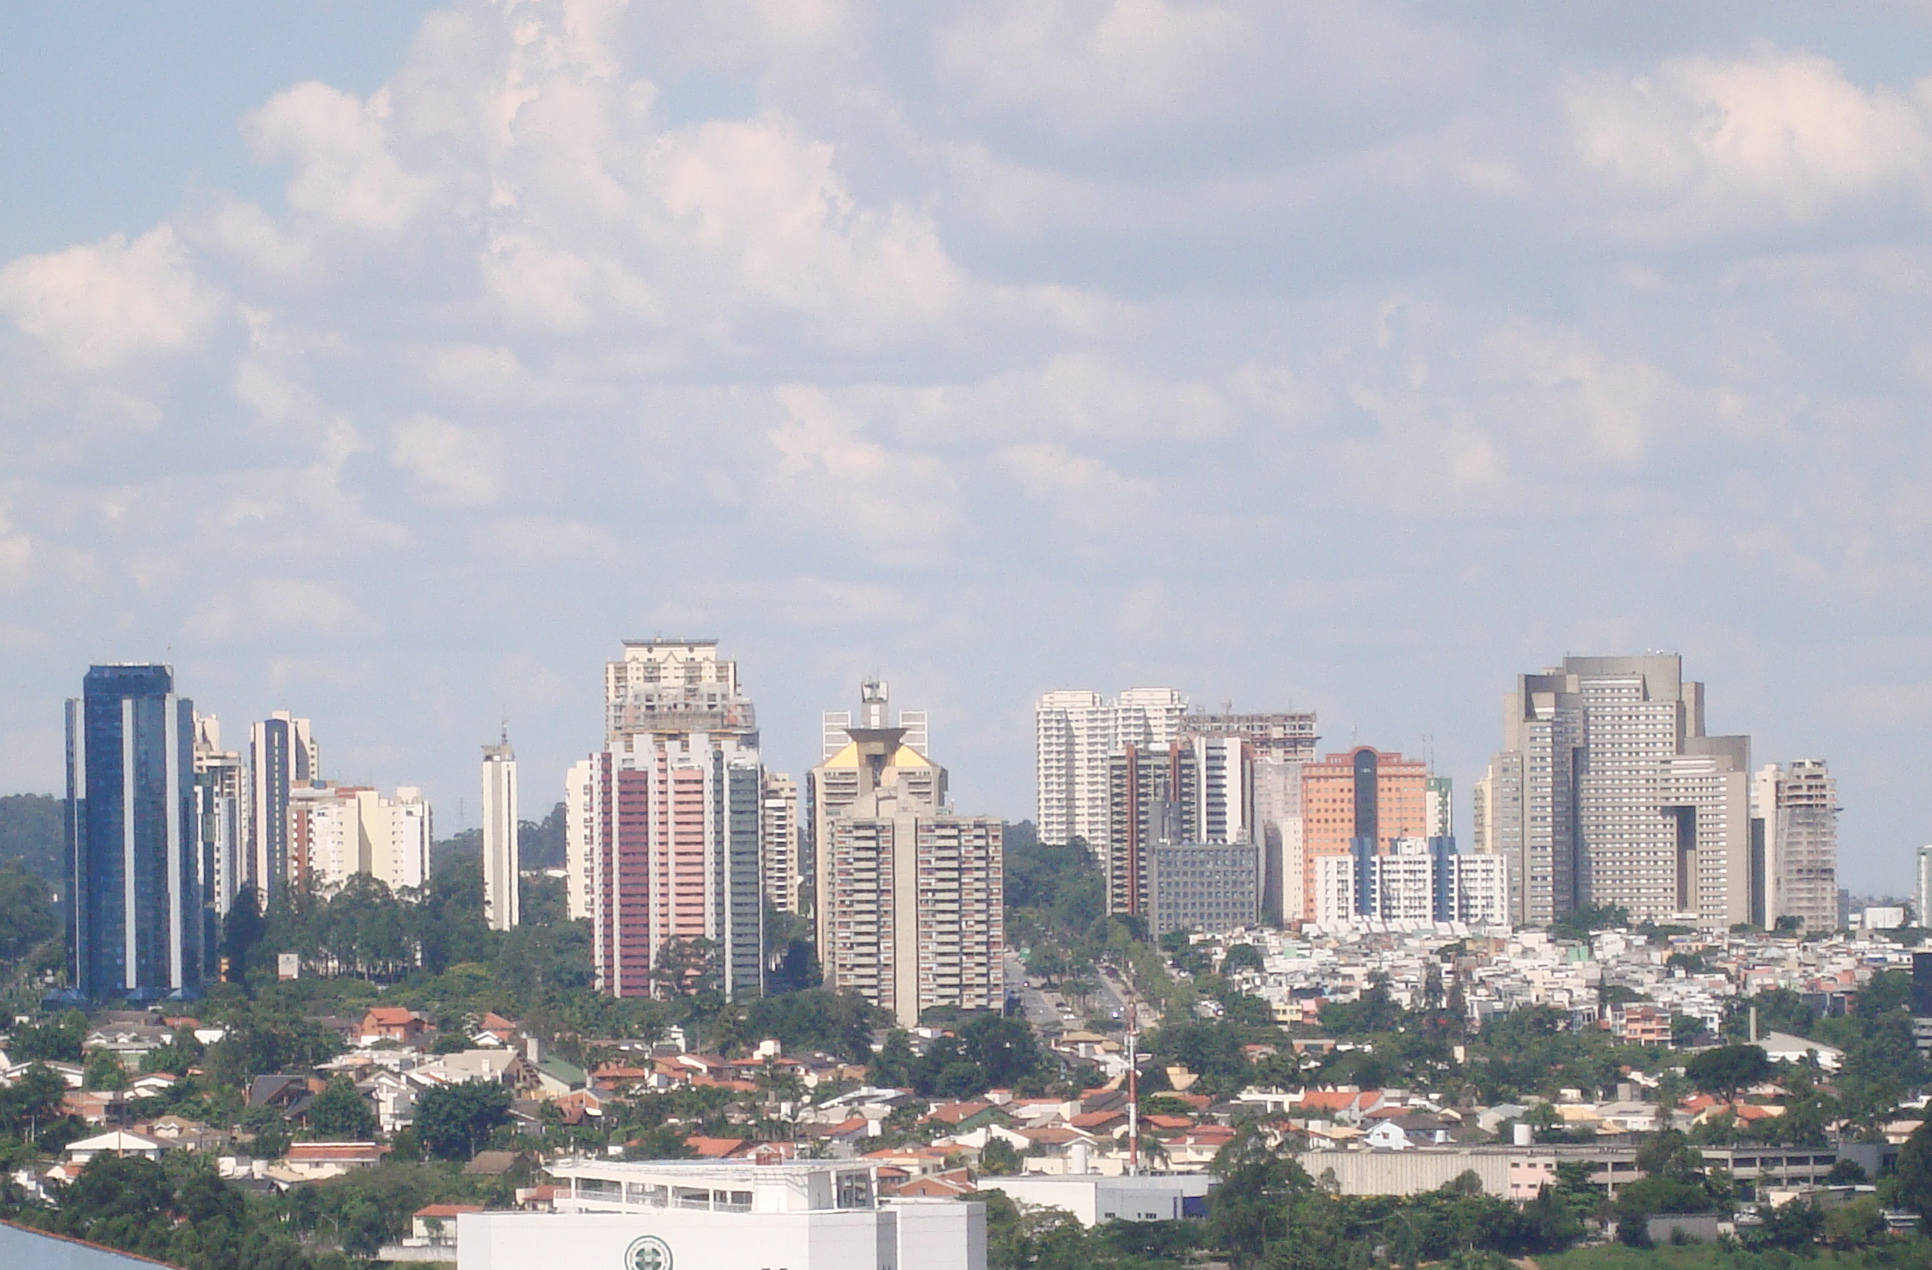 Barueri São Paulo fonte: upload.wikimedia.org